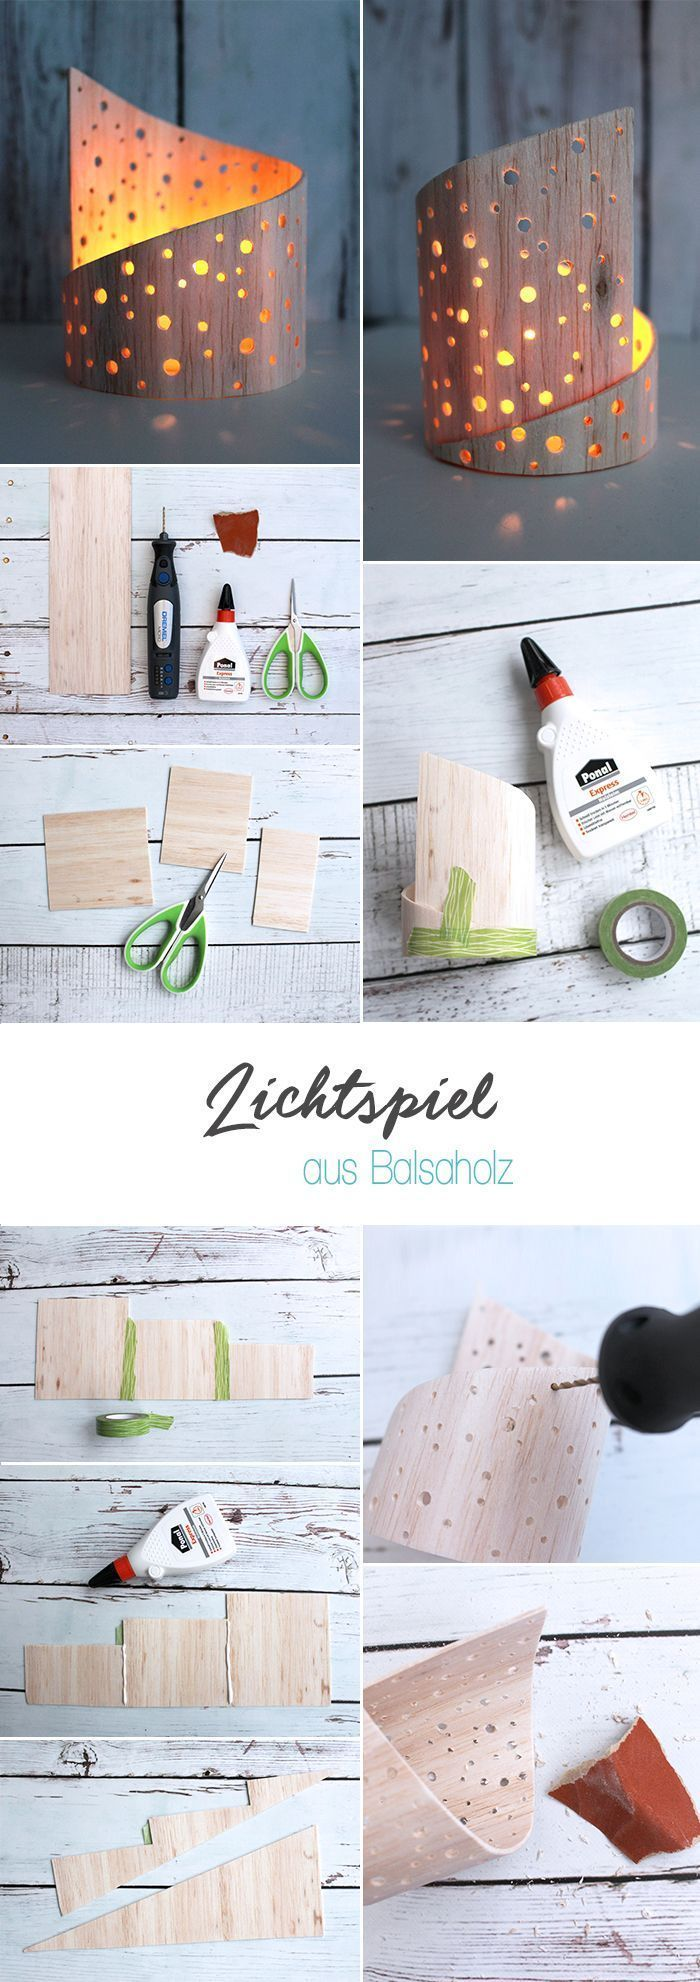 Do it yourself: Lichtspiel aus Balsaholz selbst basteln - was eigenes {DIY & food Blog} - Ich Folge #holzideen